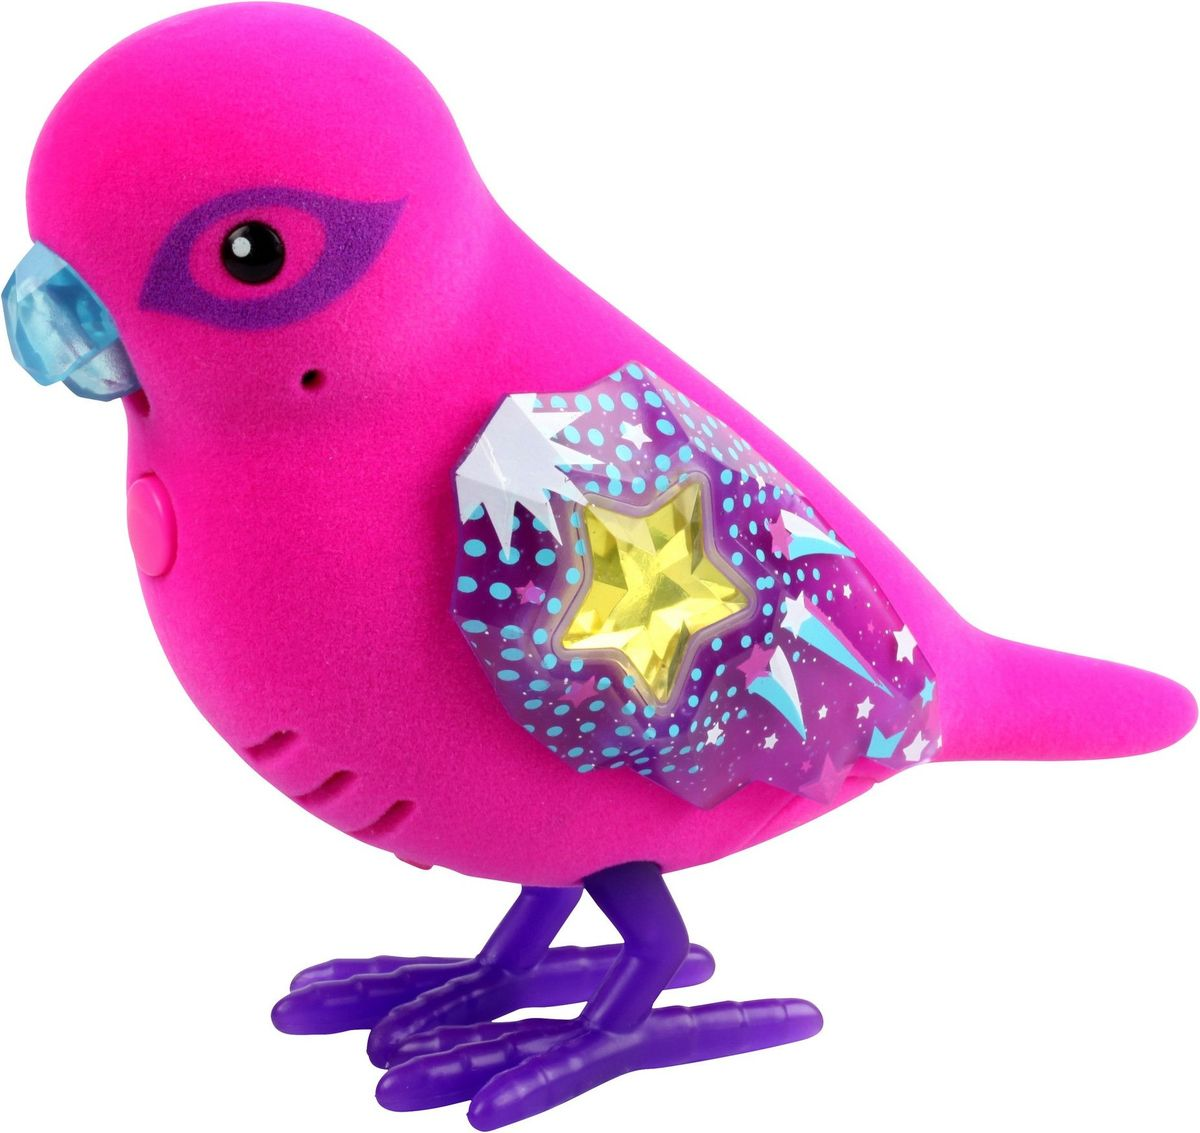 Little Live Pets Интерактивная игрушка Птичка Super Sarah - Интерактивные игрушки